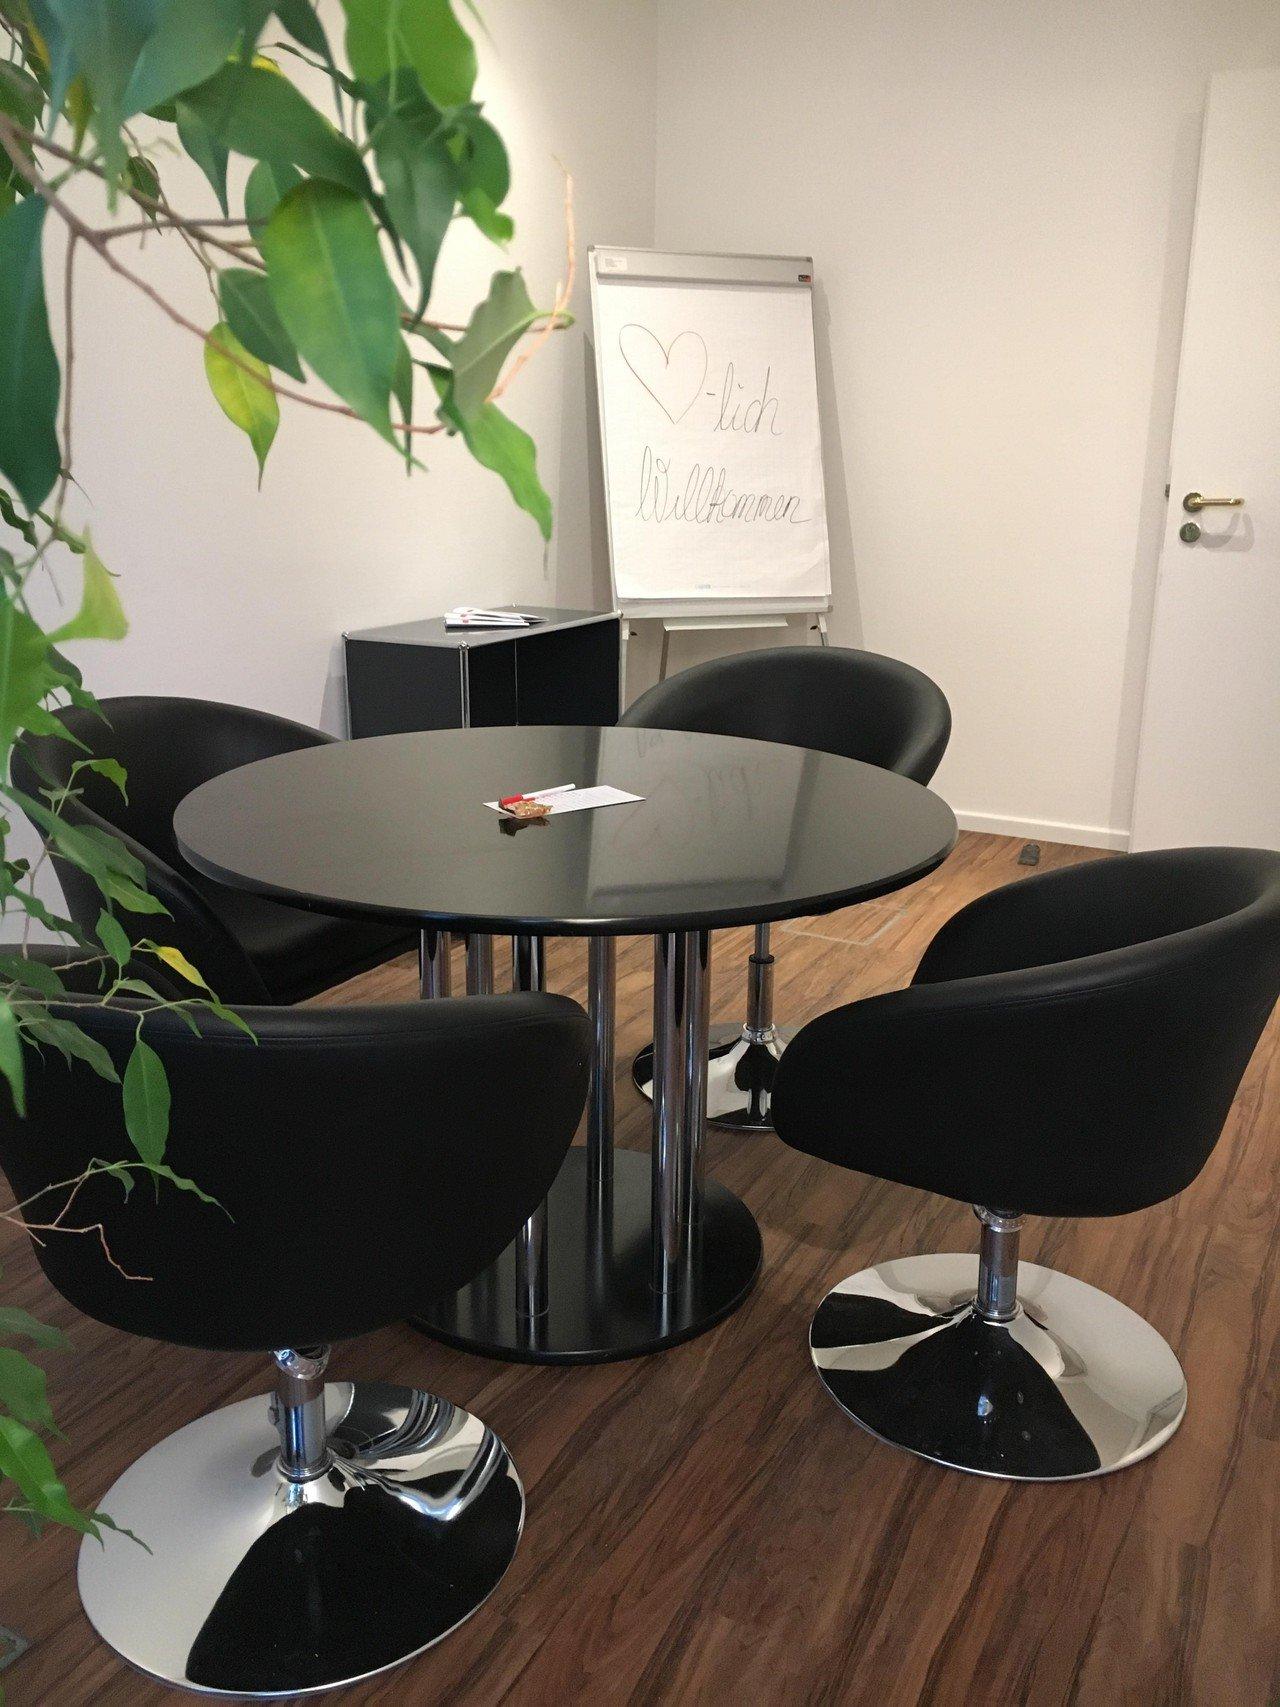 Hamburg Besprechungsräume Meetingraum Ecos - Kontor image 0